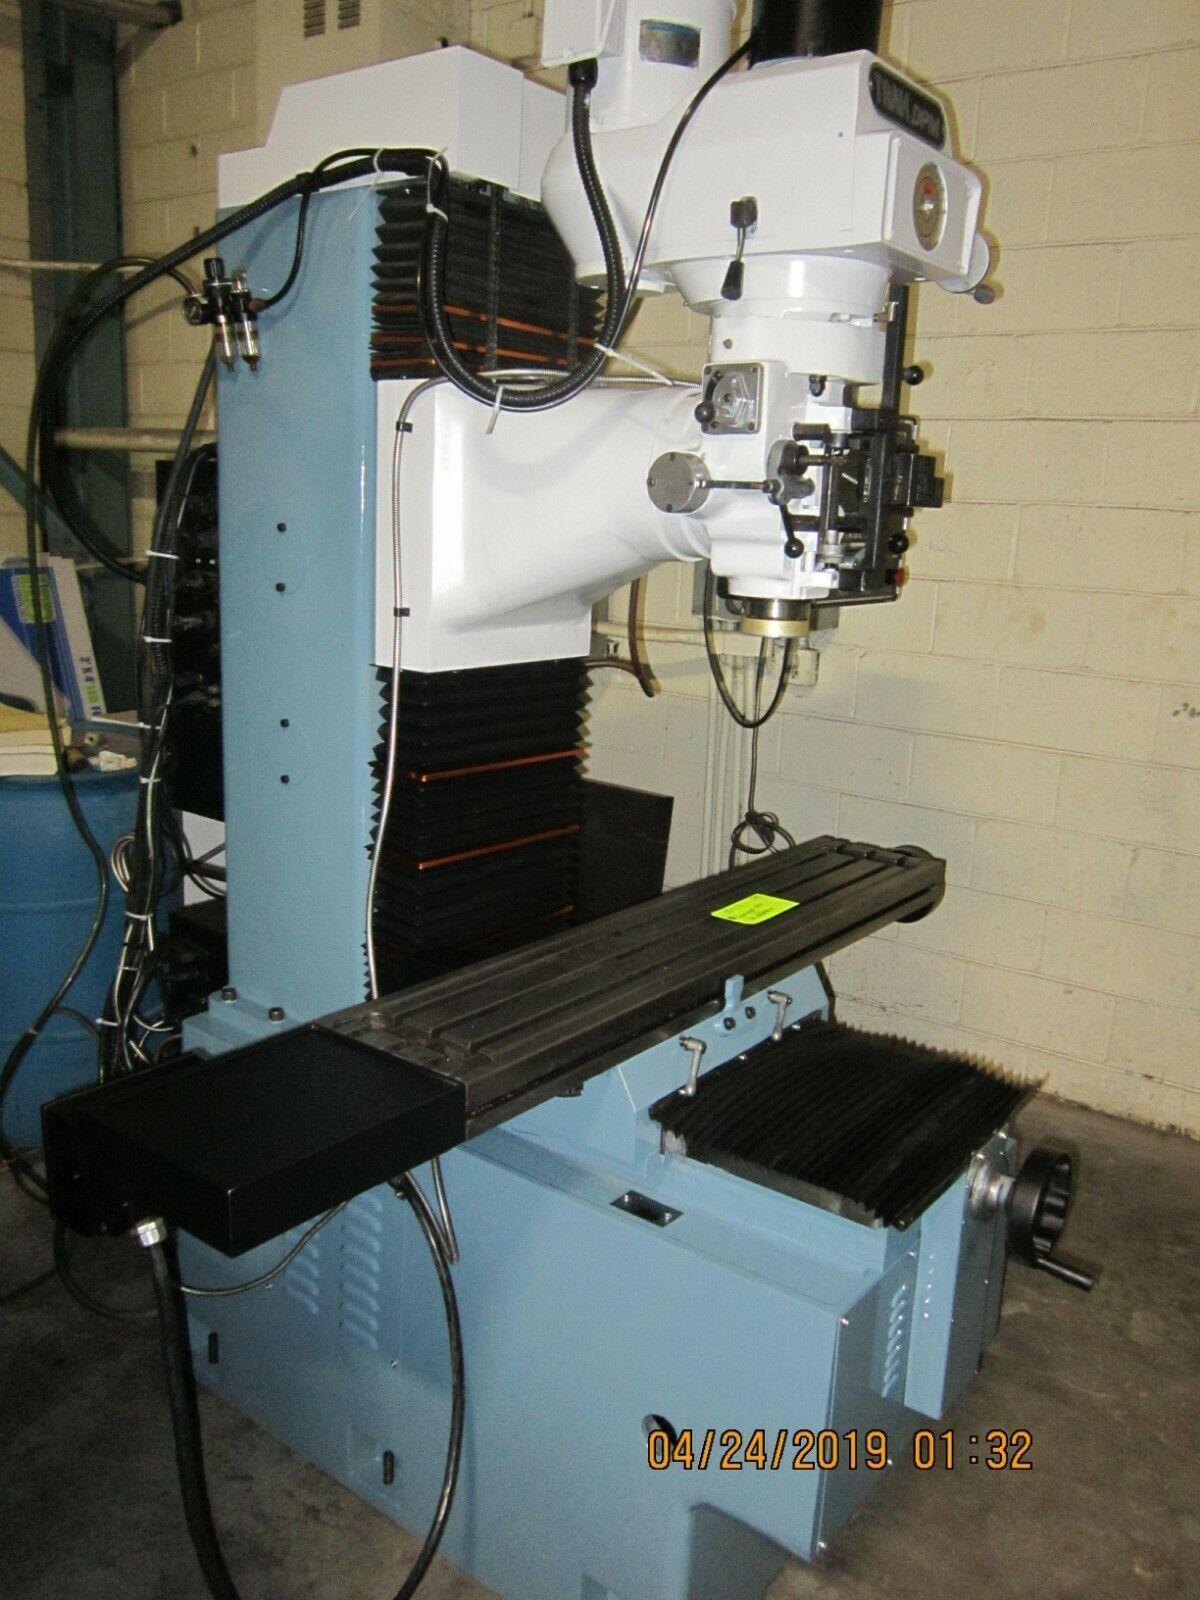 Southwestern Trak-DPM CNC Mill